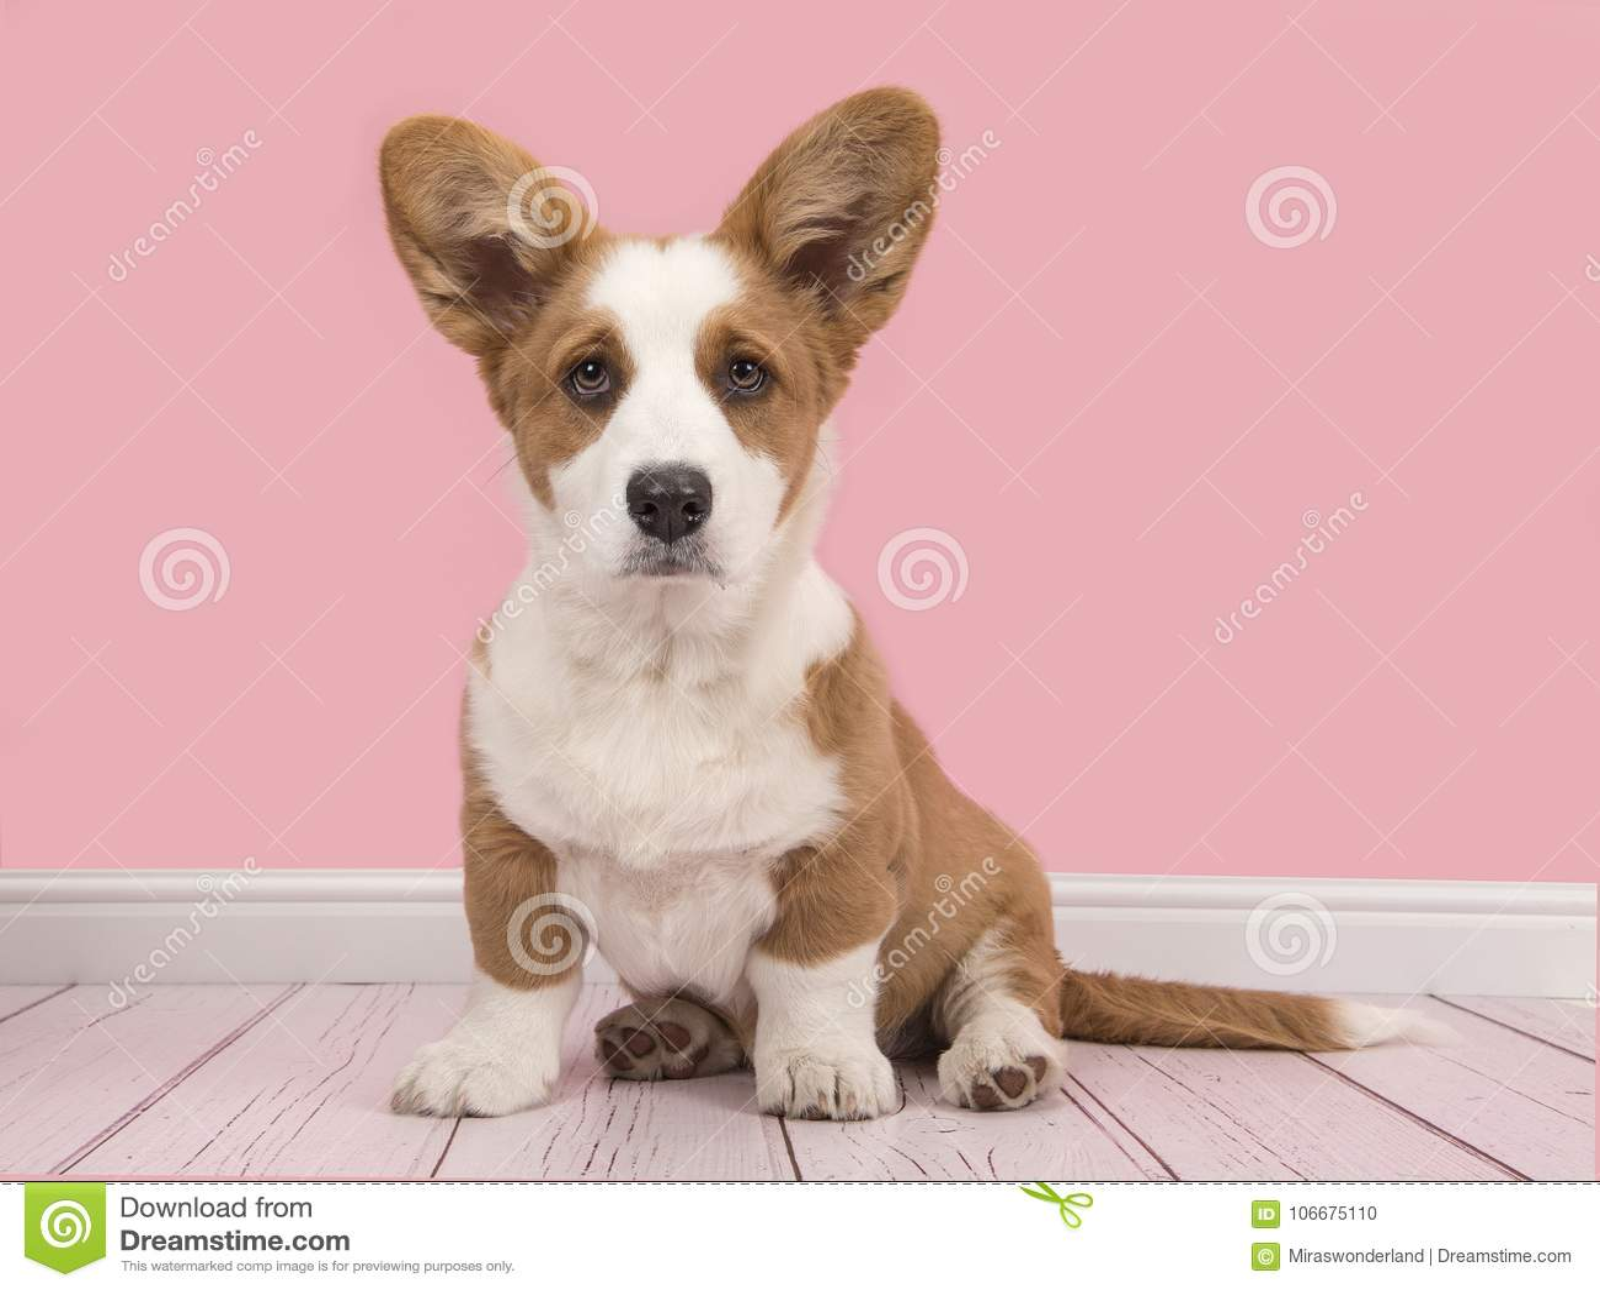 Cute welsh pembroke corgi puppy in a pink living room